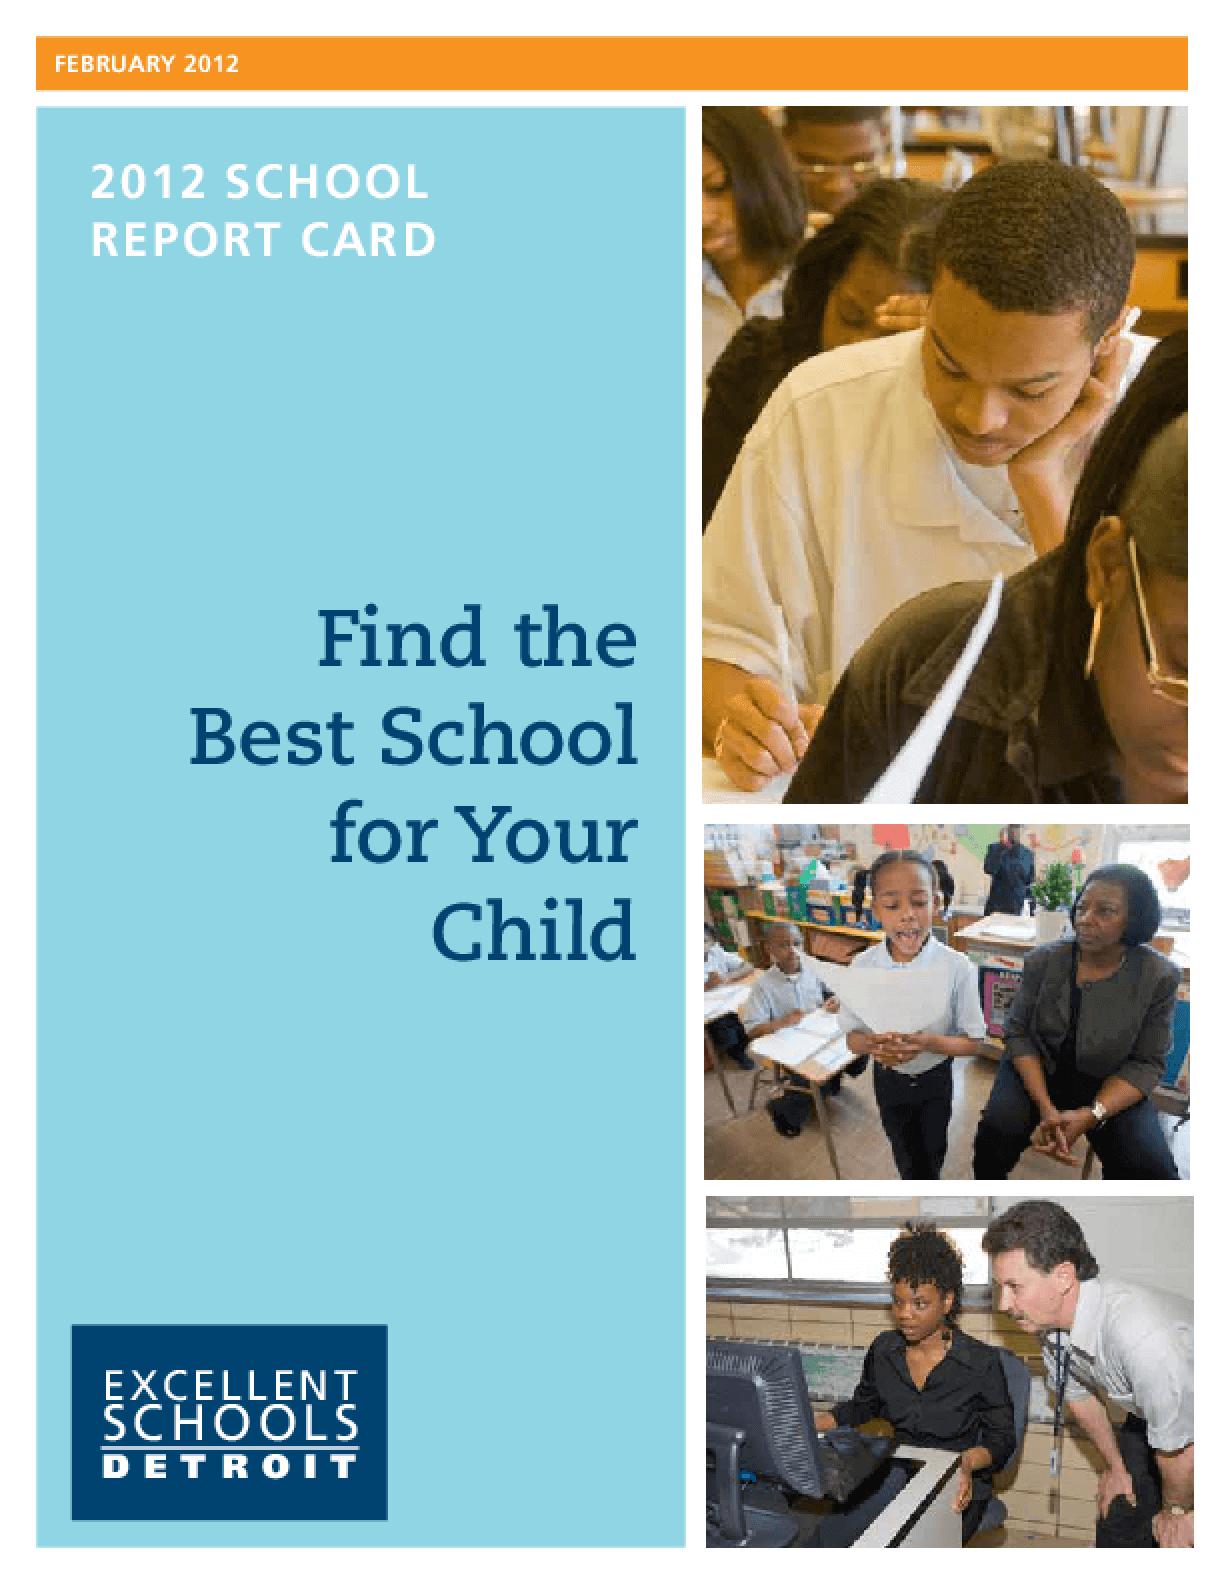 Excellent Schools Detroit: 2012 School Report Card